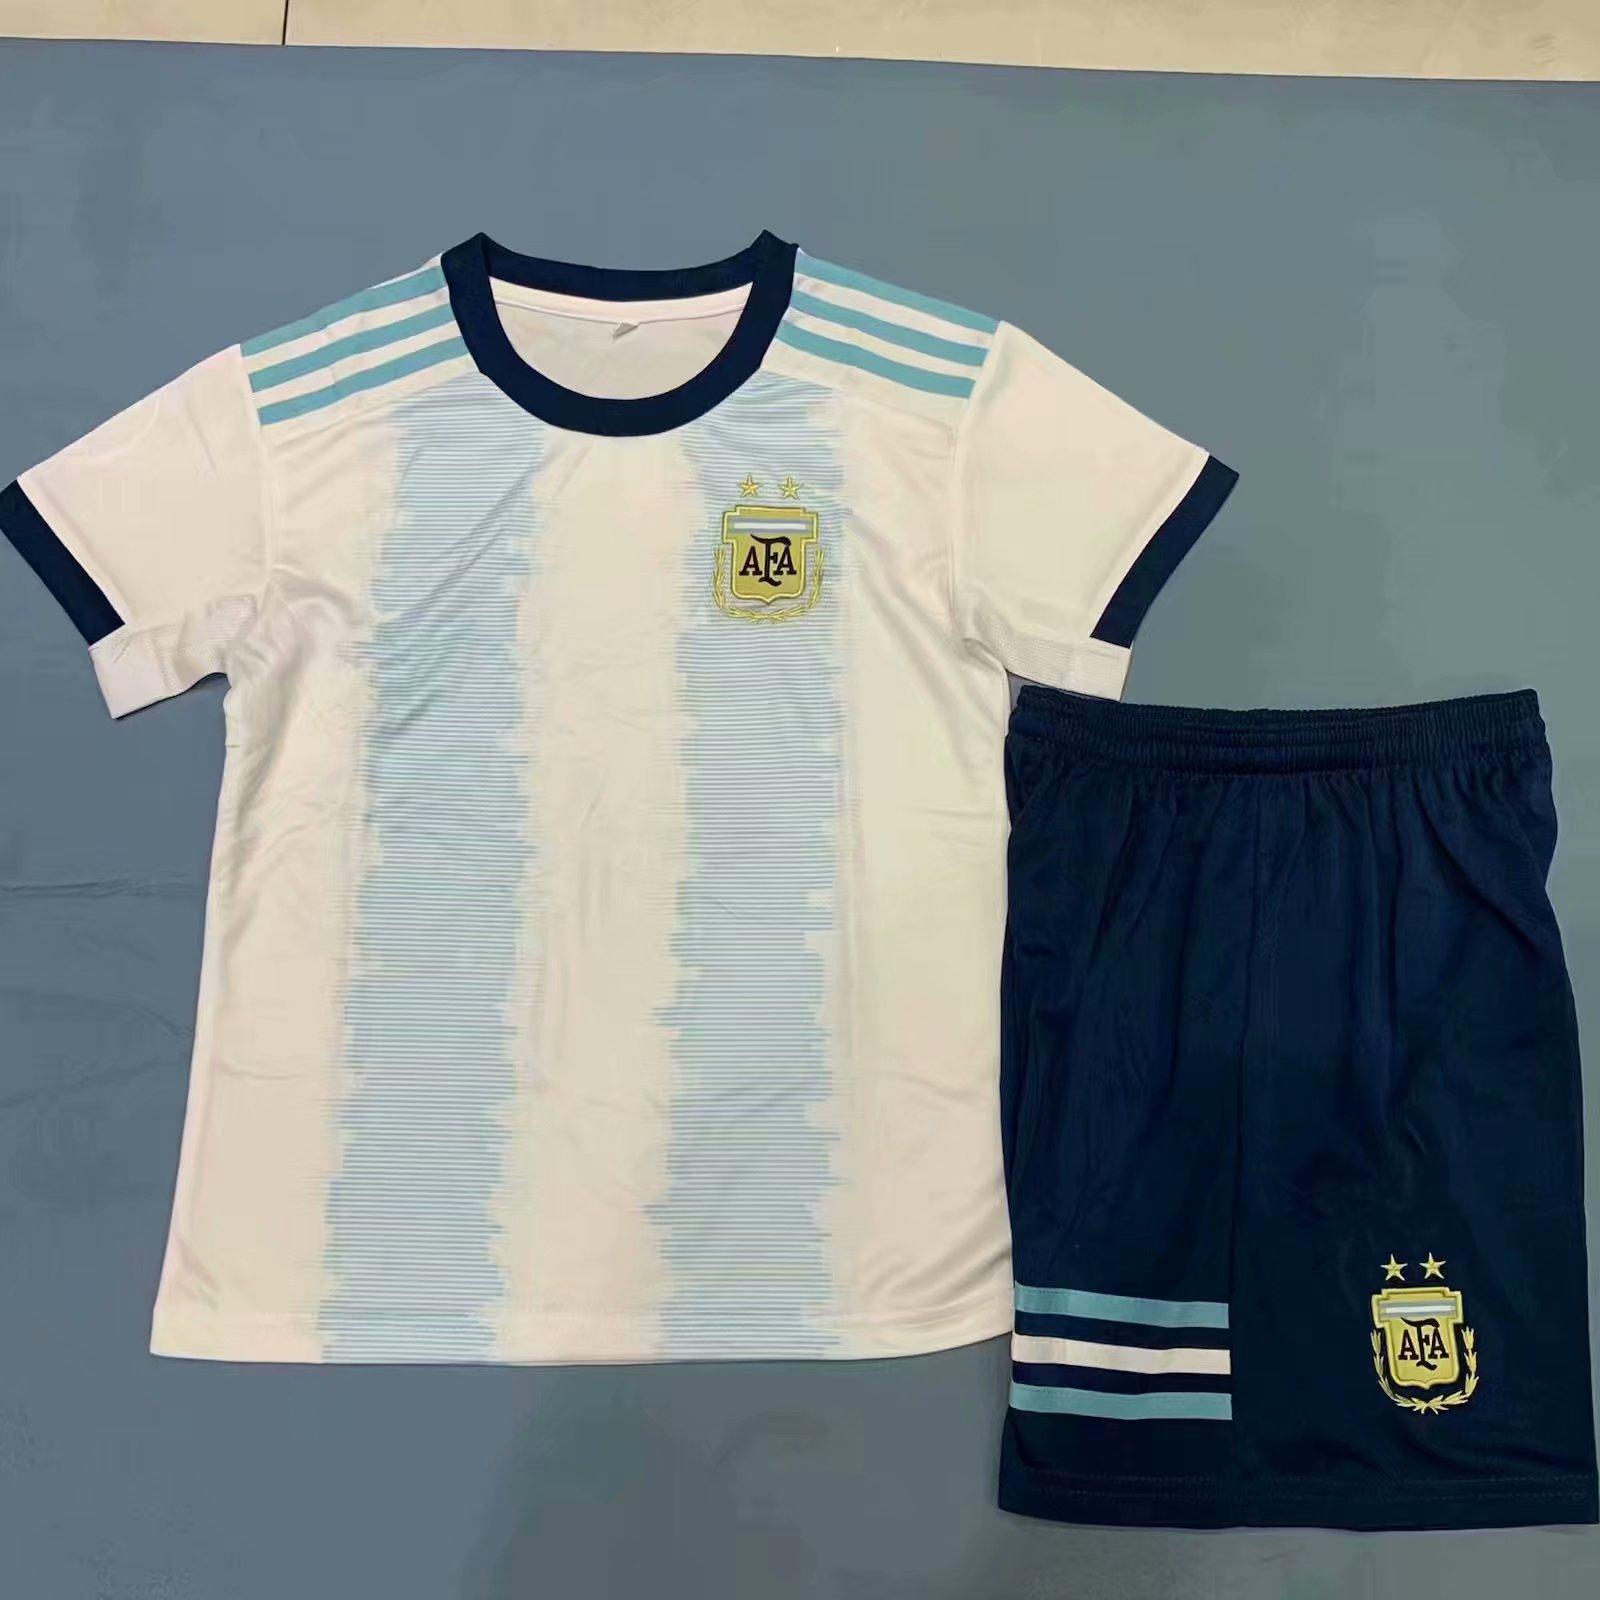 c4fd81a8690 2019 20 Kids Argentina Copa America Home Soccer Jersey Uniforms